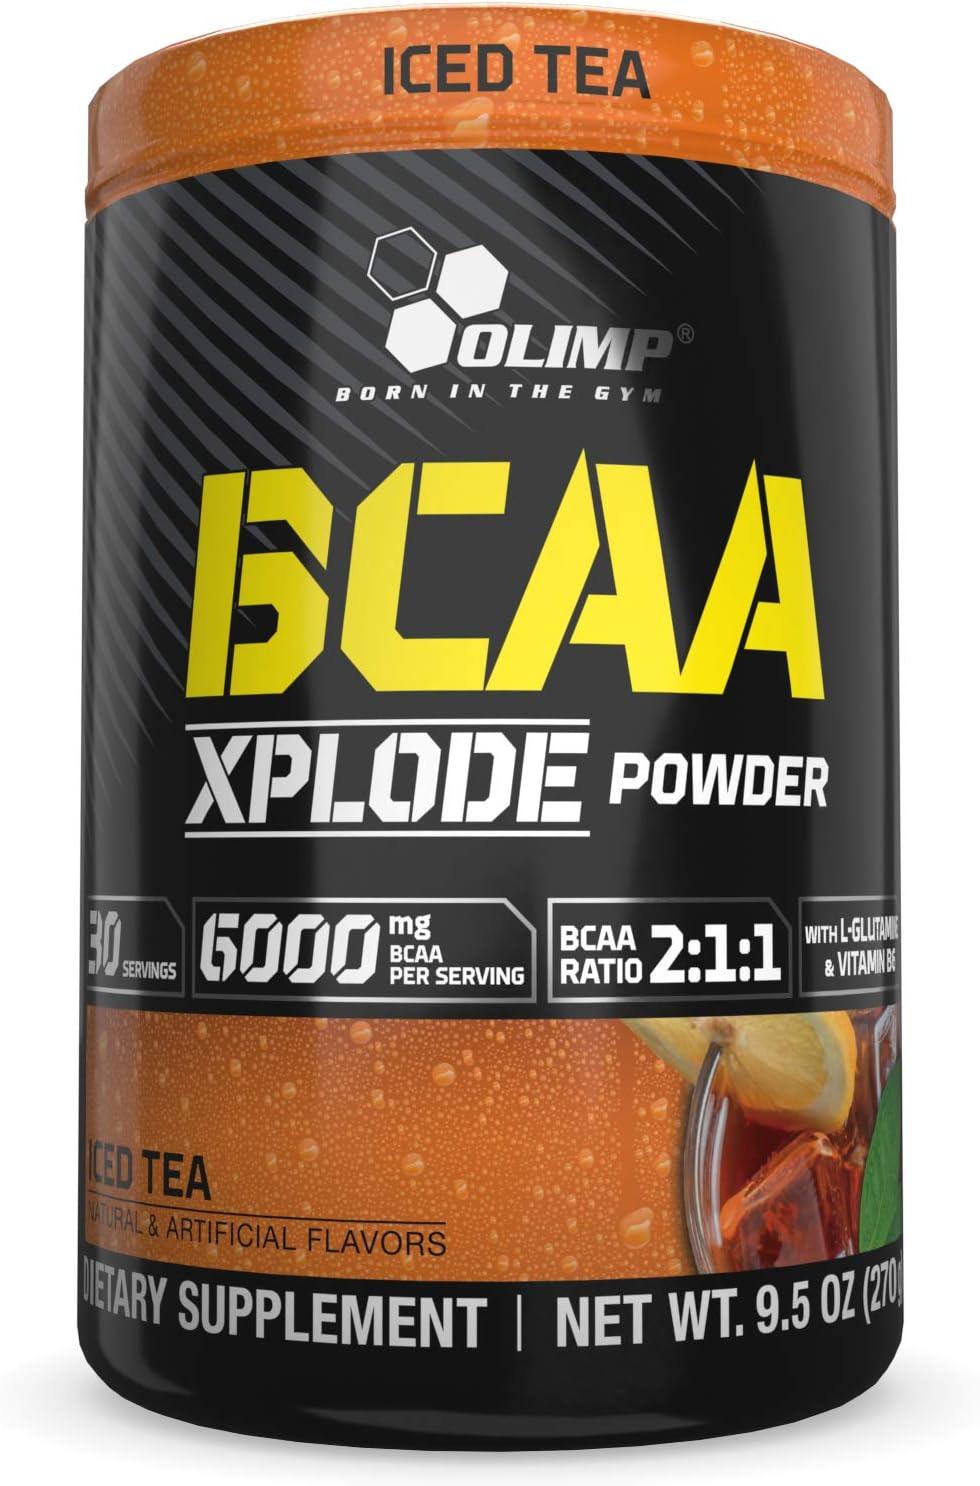 Olimp BCAA Xplode Amino Acids Powder - Pack of 9.5 oz - 30 Servings - Iced Tea Flavored - Recovery Supplement - L-Glutamine, Vitamine B6, Calcium, Sodium